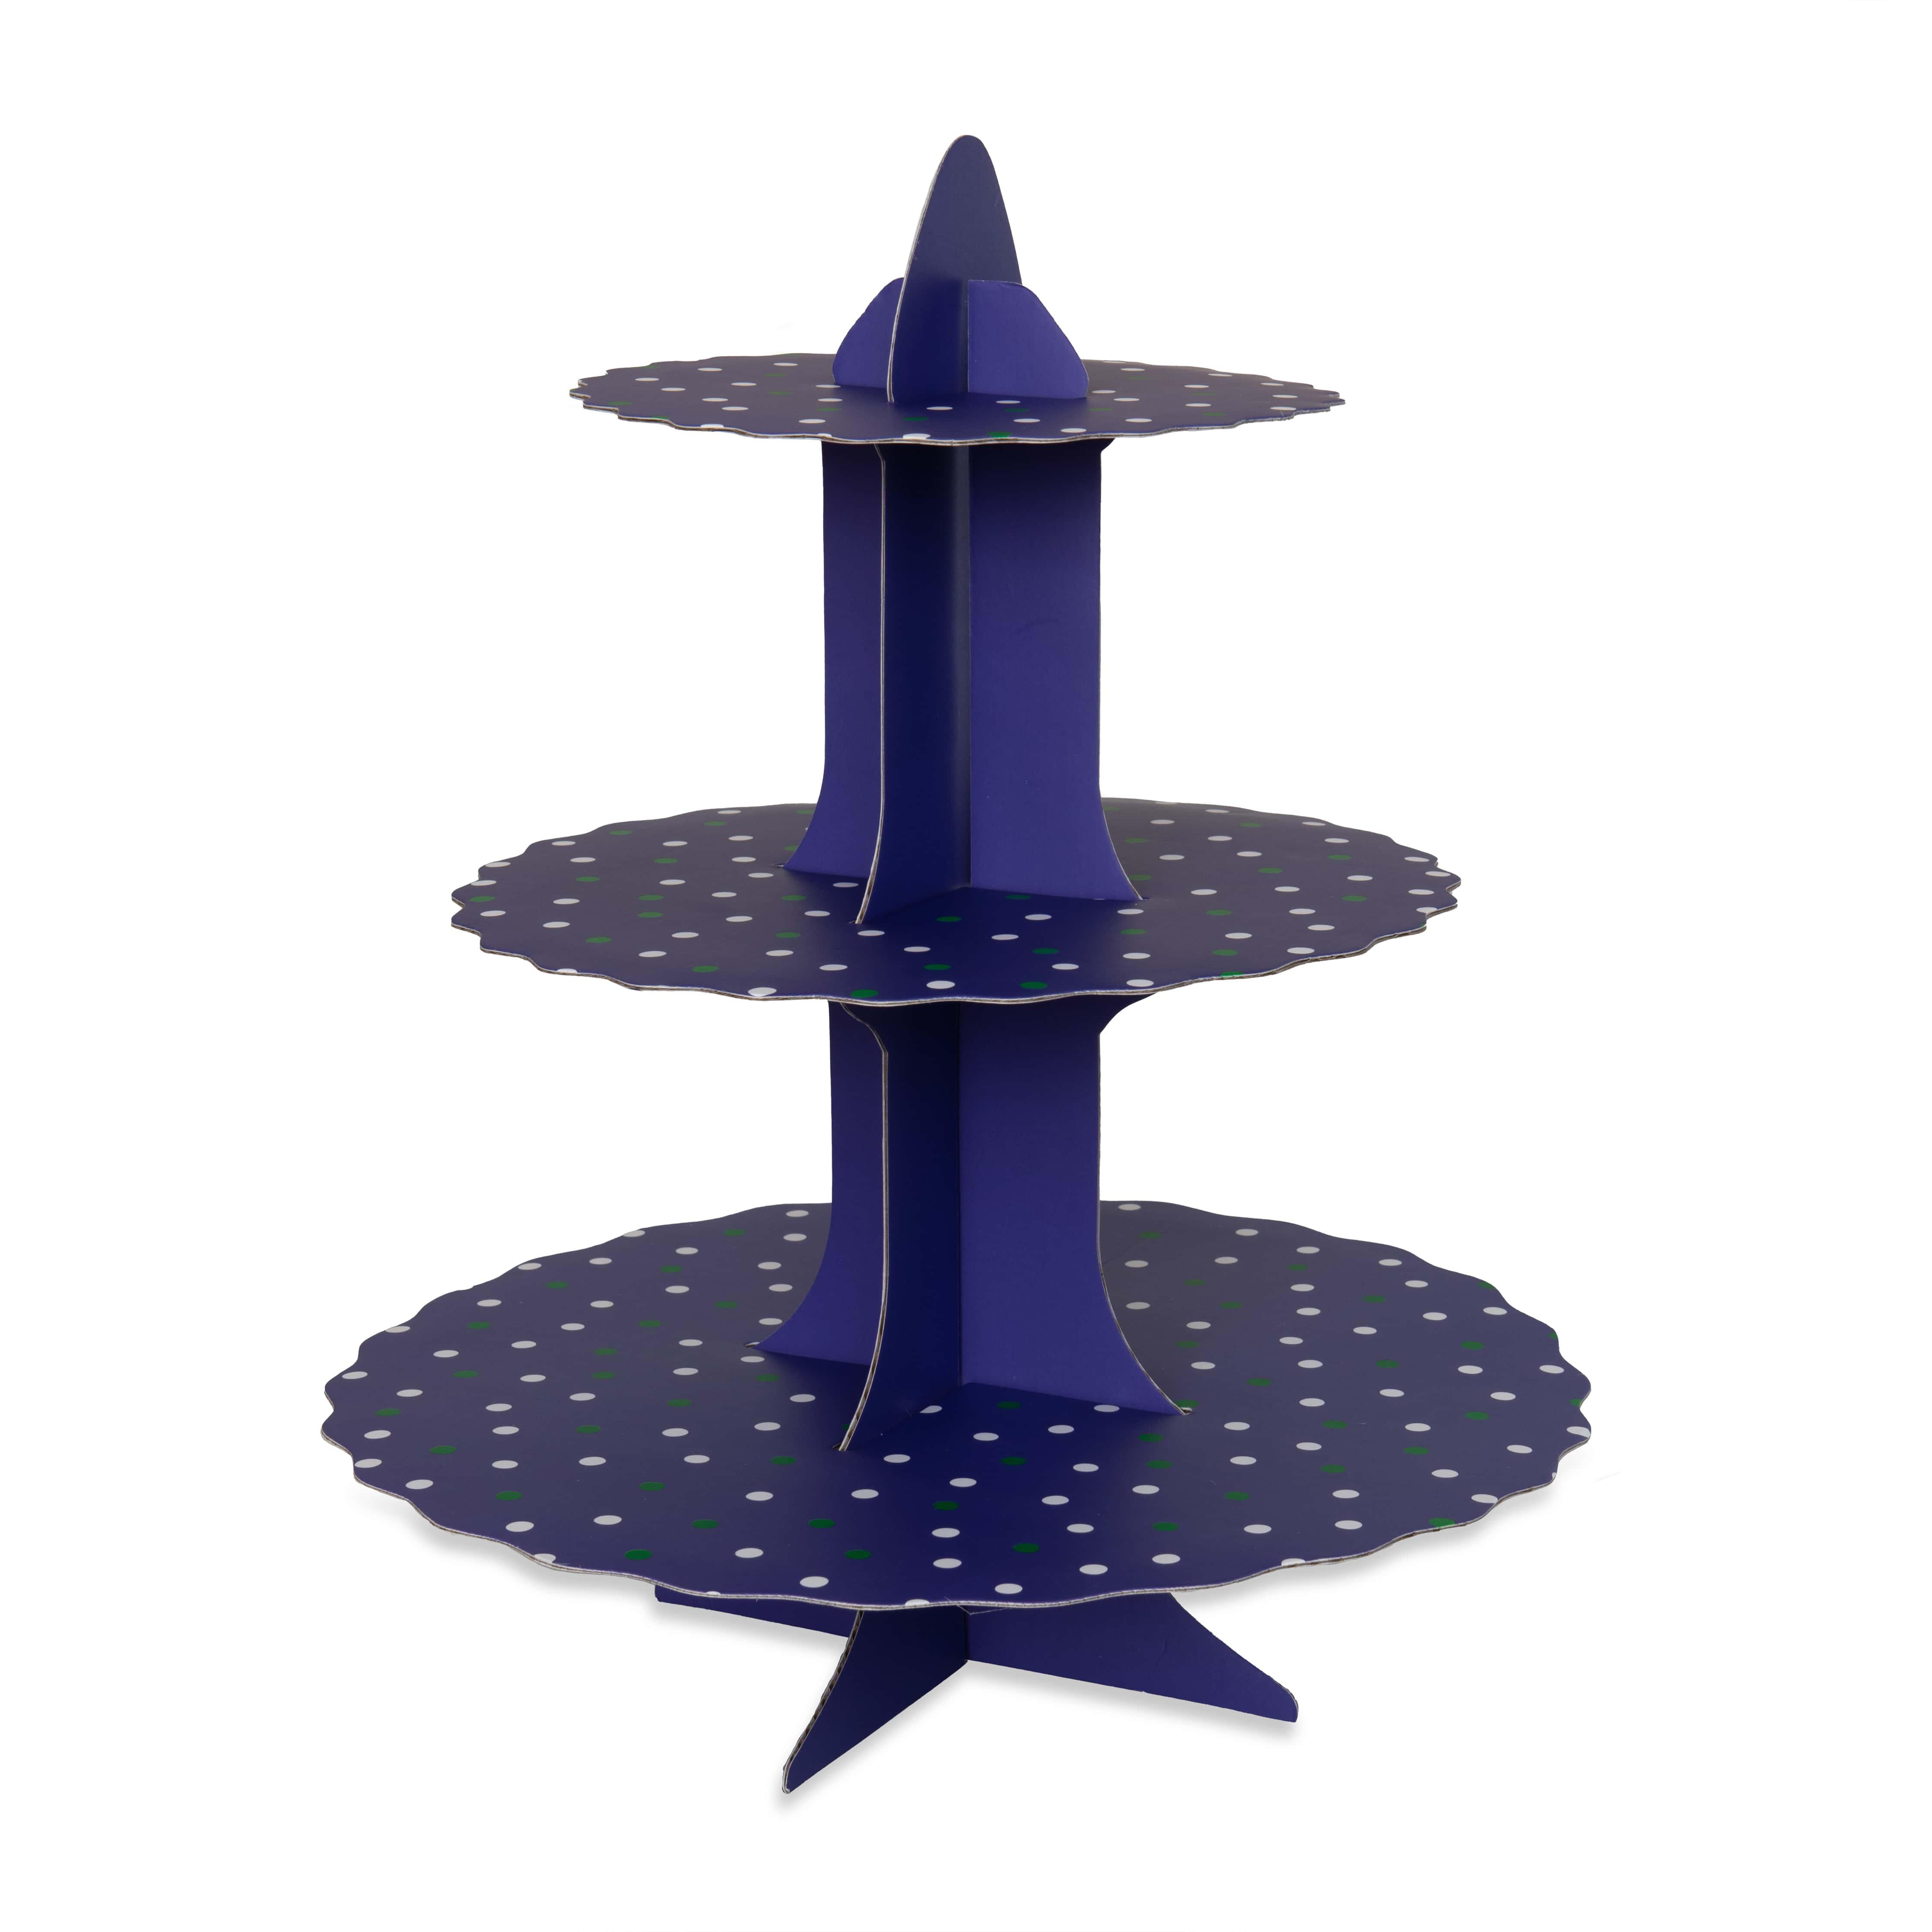 A  purple cake stand made of cardboard.